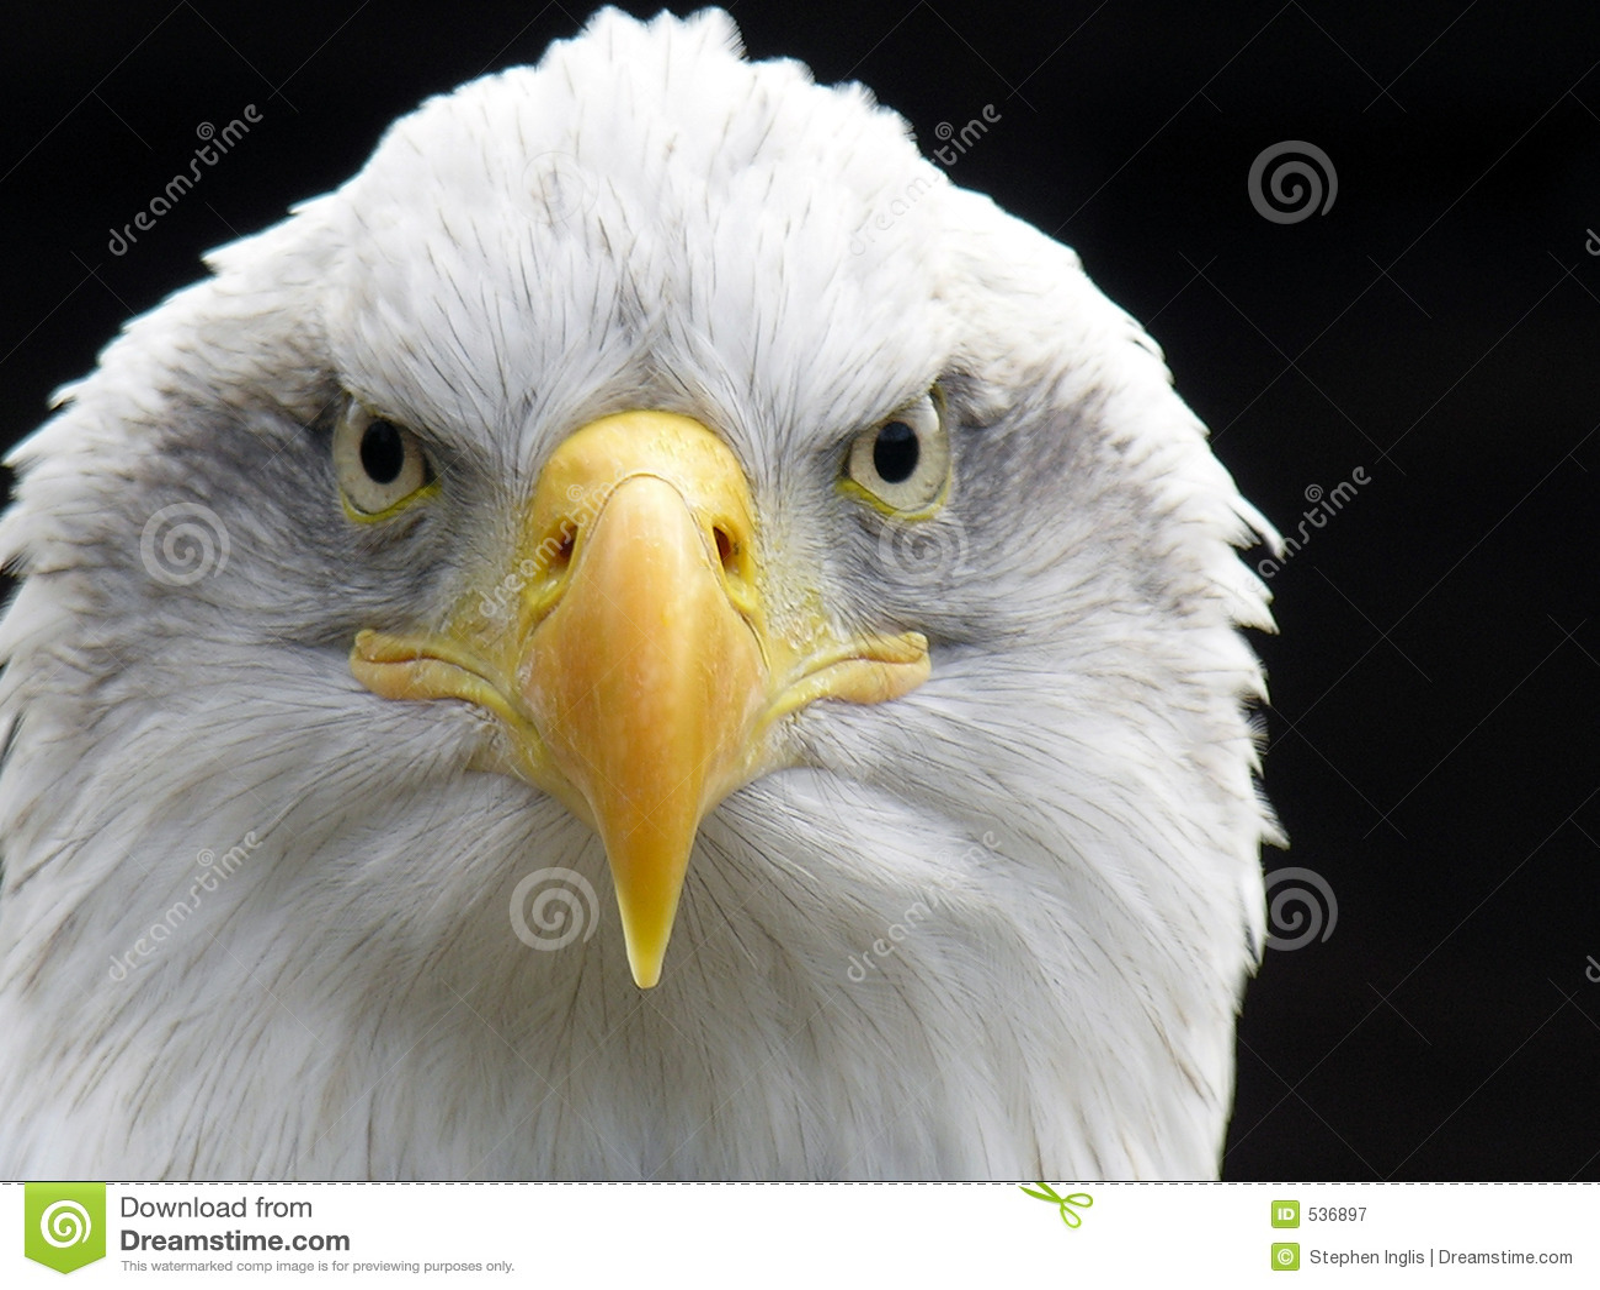 Download 白头鹰 库存图片. 图片 包括有 本质, 很快, 烧杯, 飞行, 老鹰, 猎人, 眼睛, 强大, 被平衡的, 猛禽 - 536897